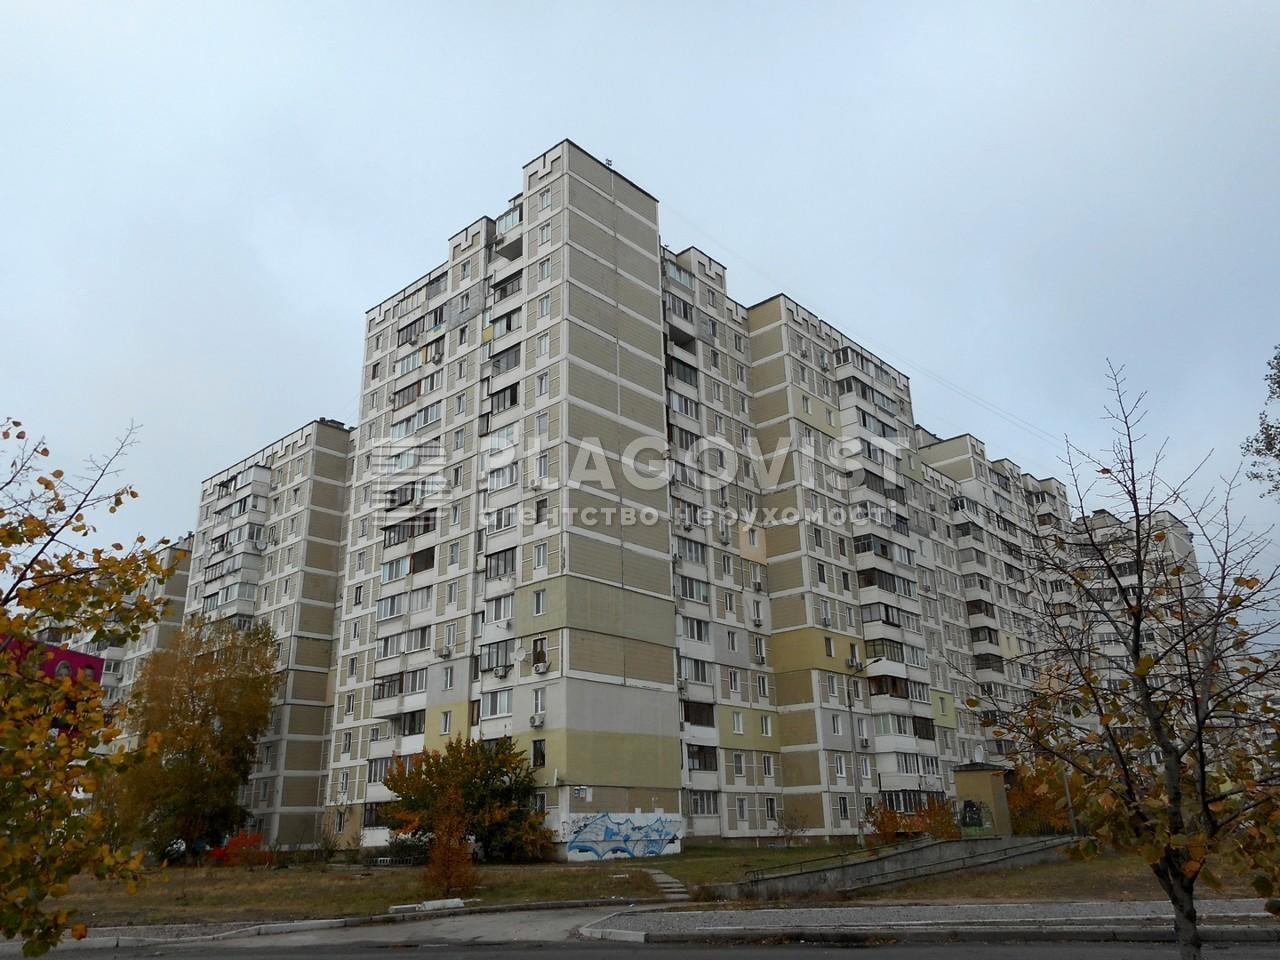 Квартира C-104323, Бальзака Оноре де, 55, Киев - Фото 1